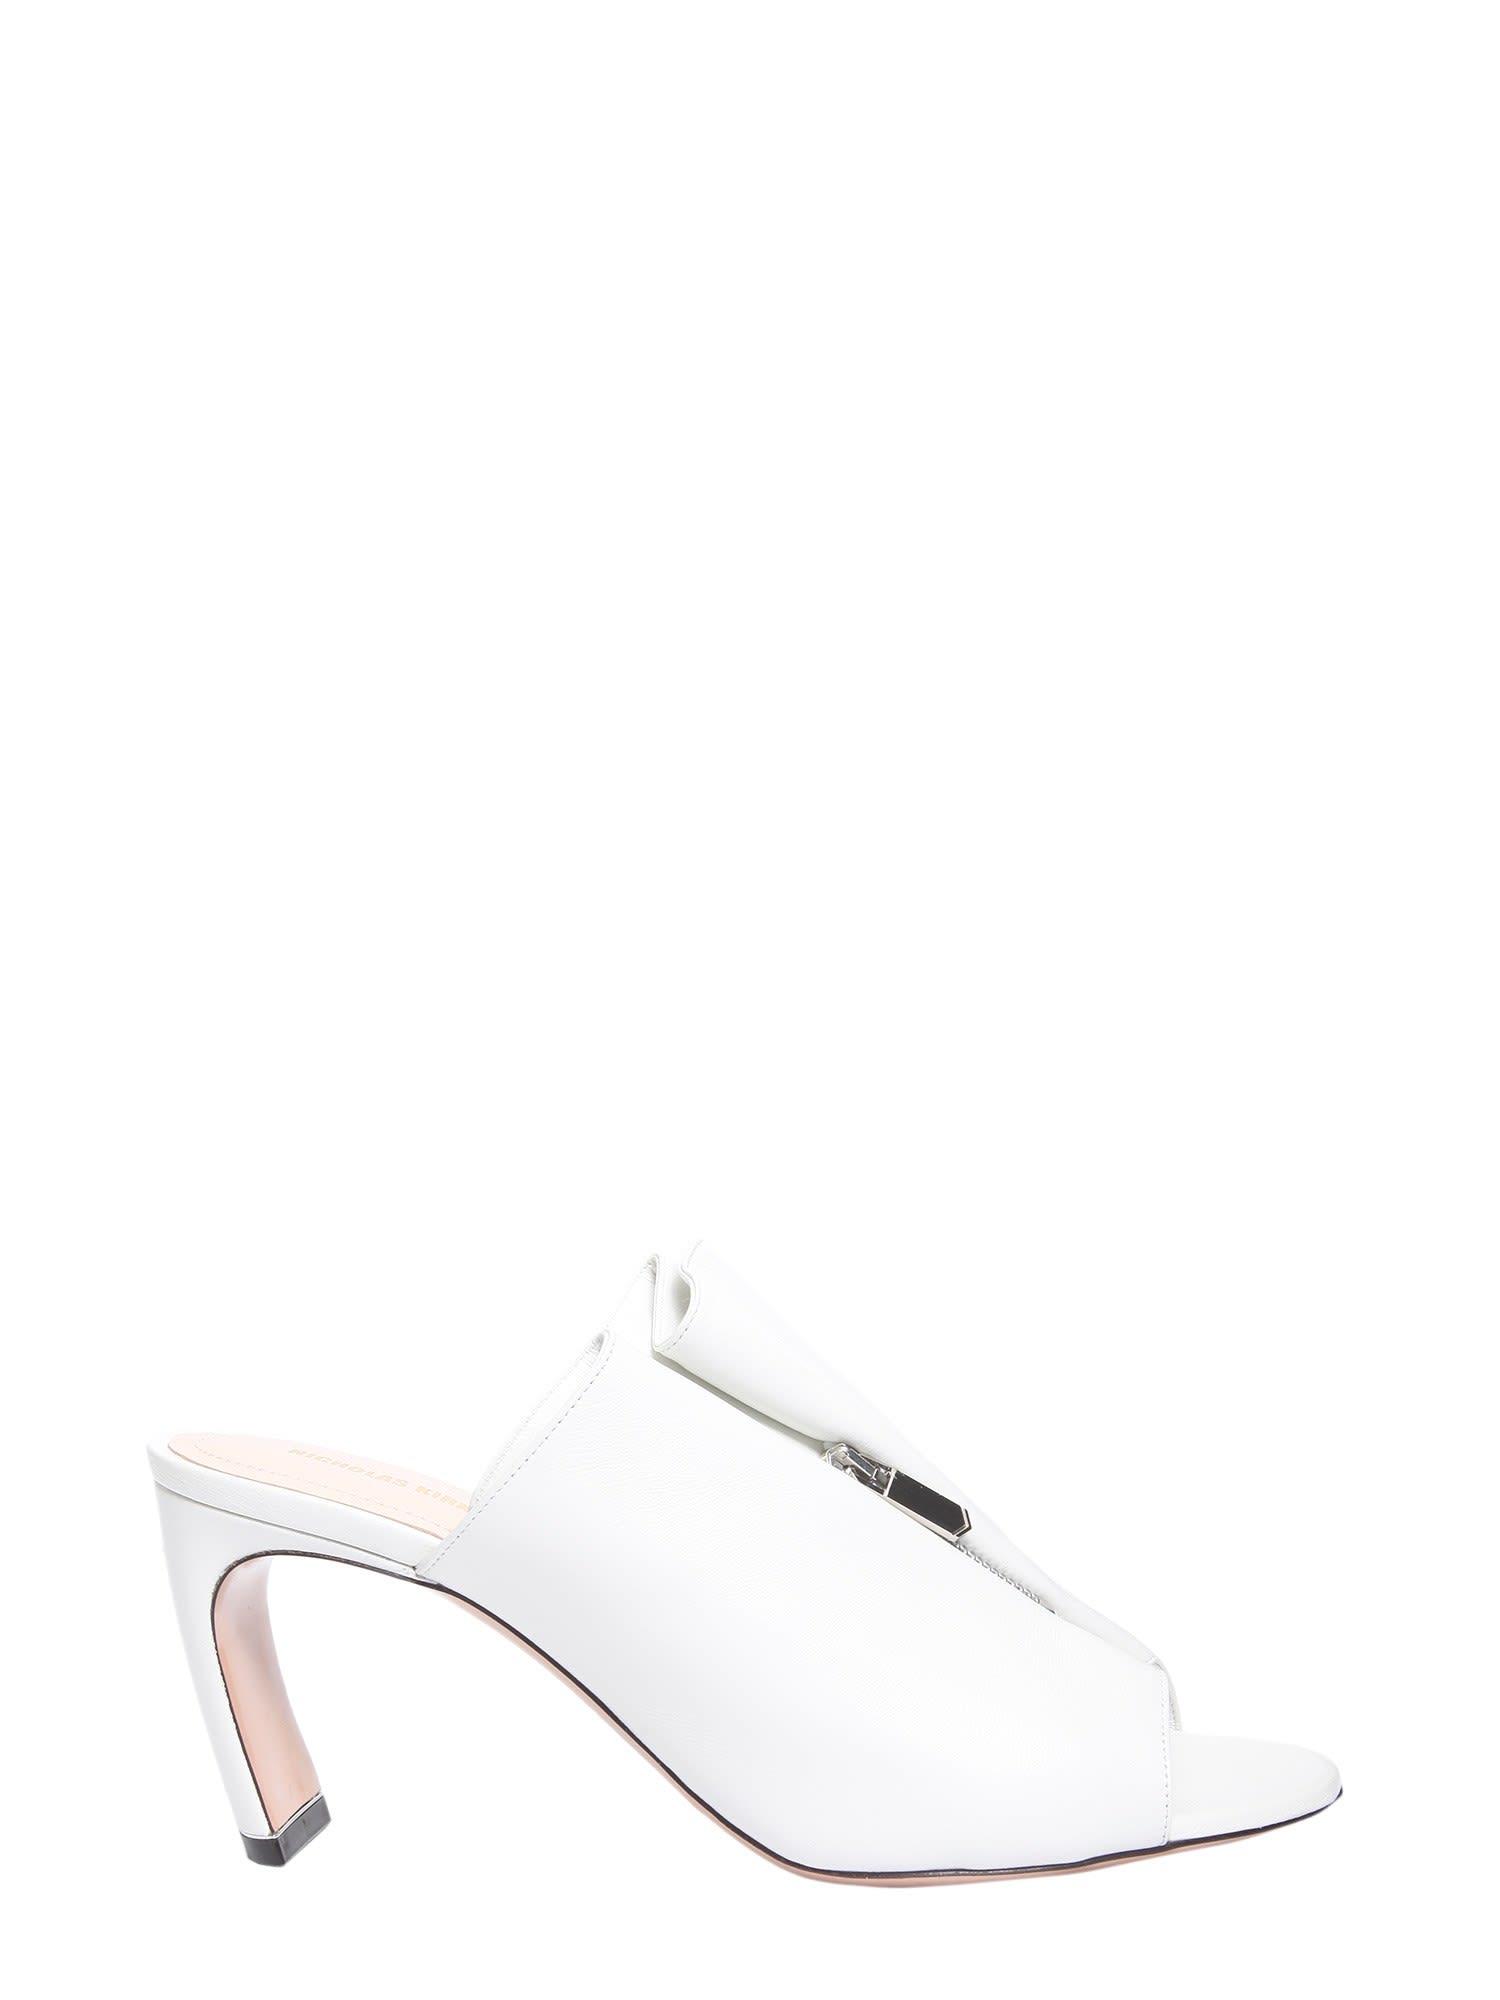 Buy Nicholas Kirkwood Kristen Mules online, shop Nicholas Kirkwood shoes with free shipping